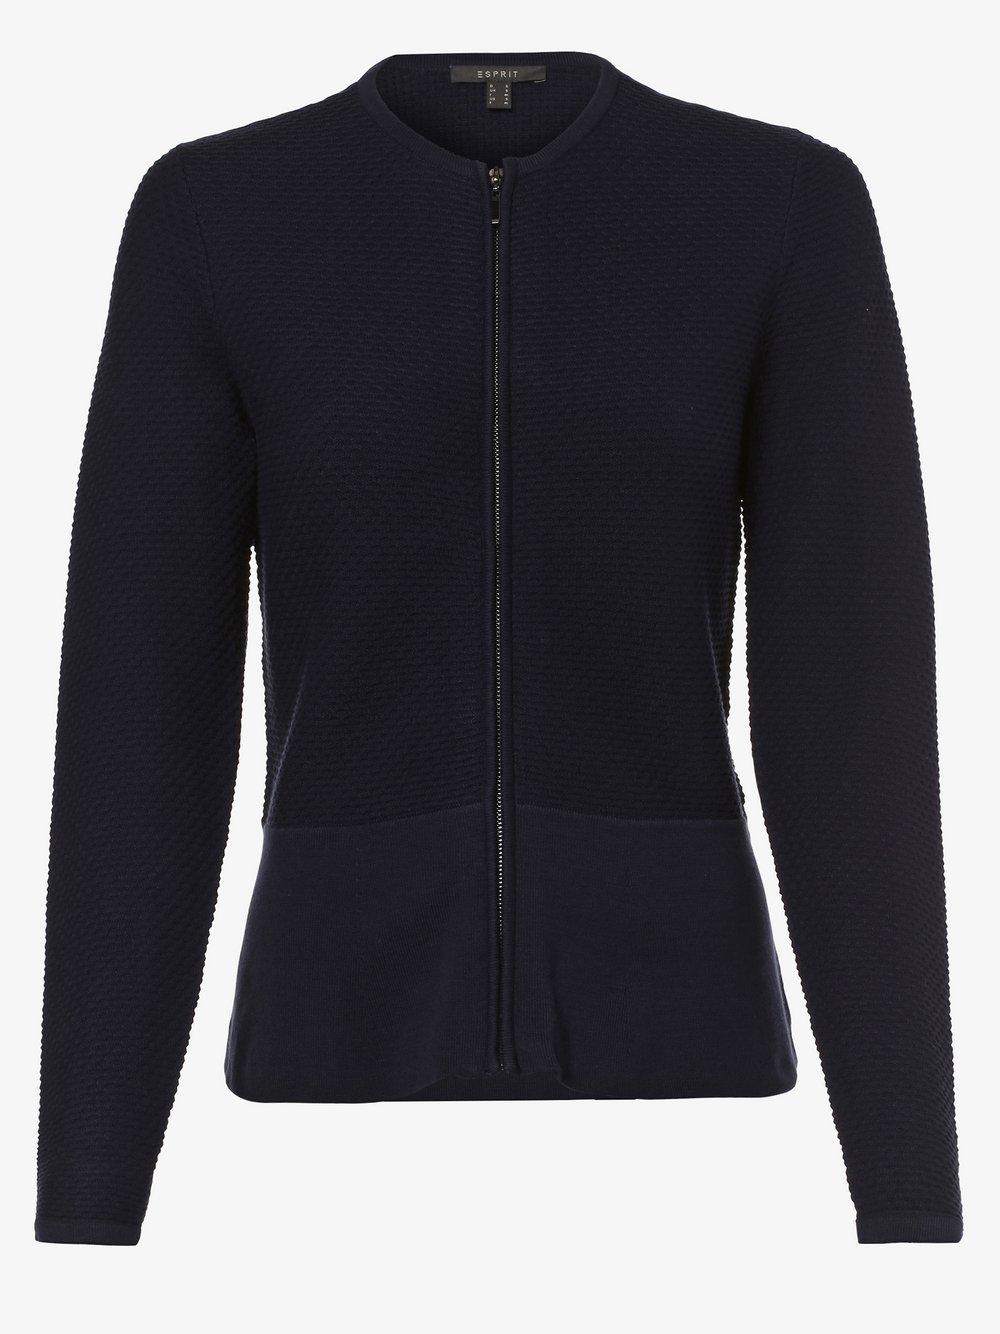 Esprit Collection – Kardigan damski, niebieski Van Graaf 455549-0002-09900